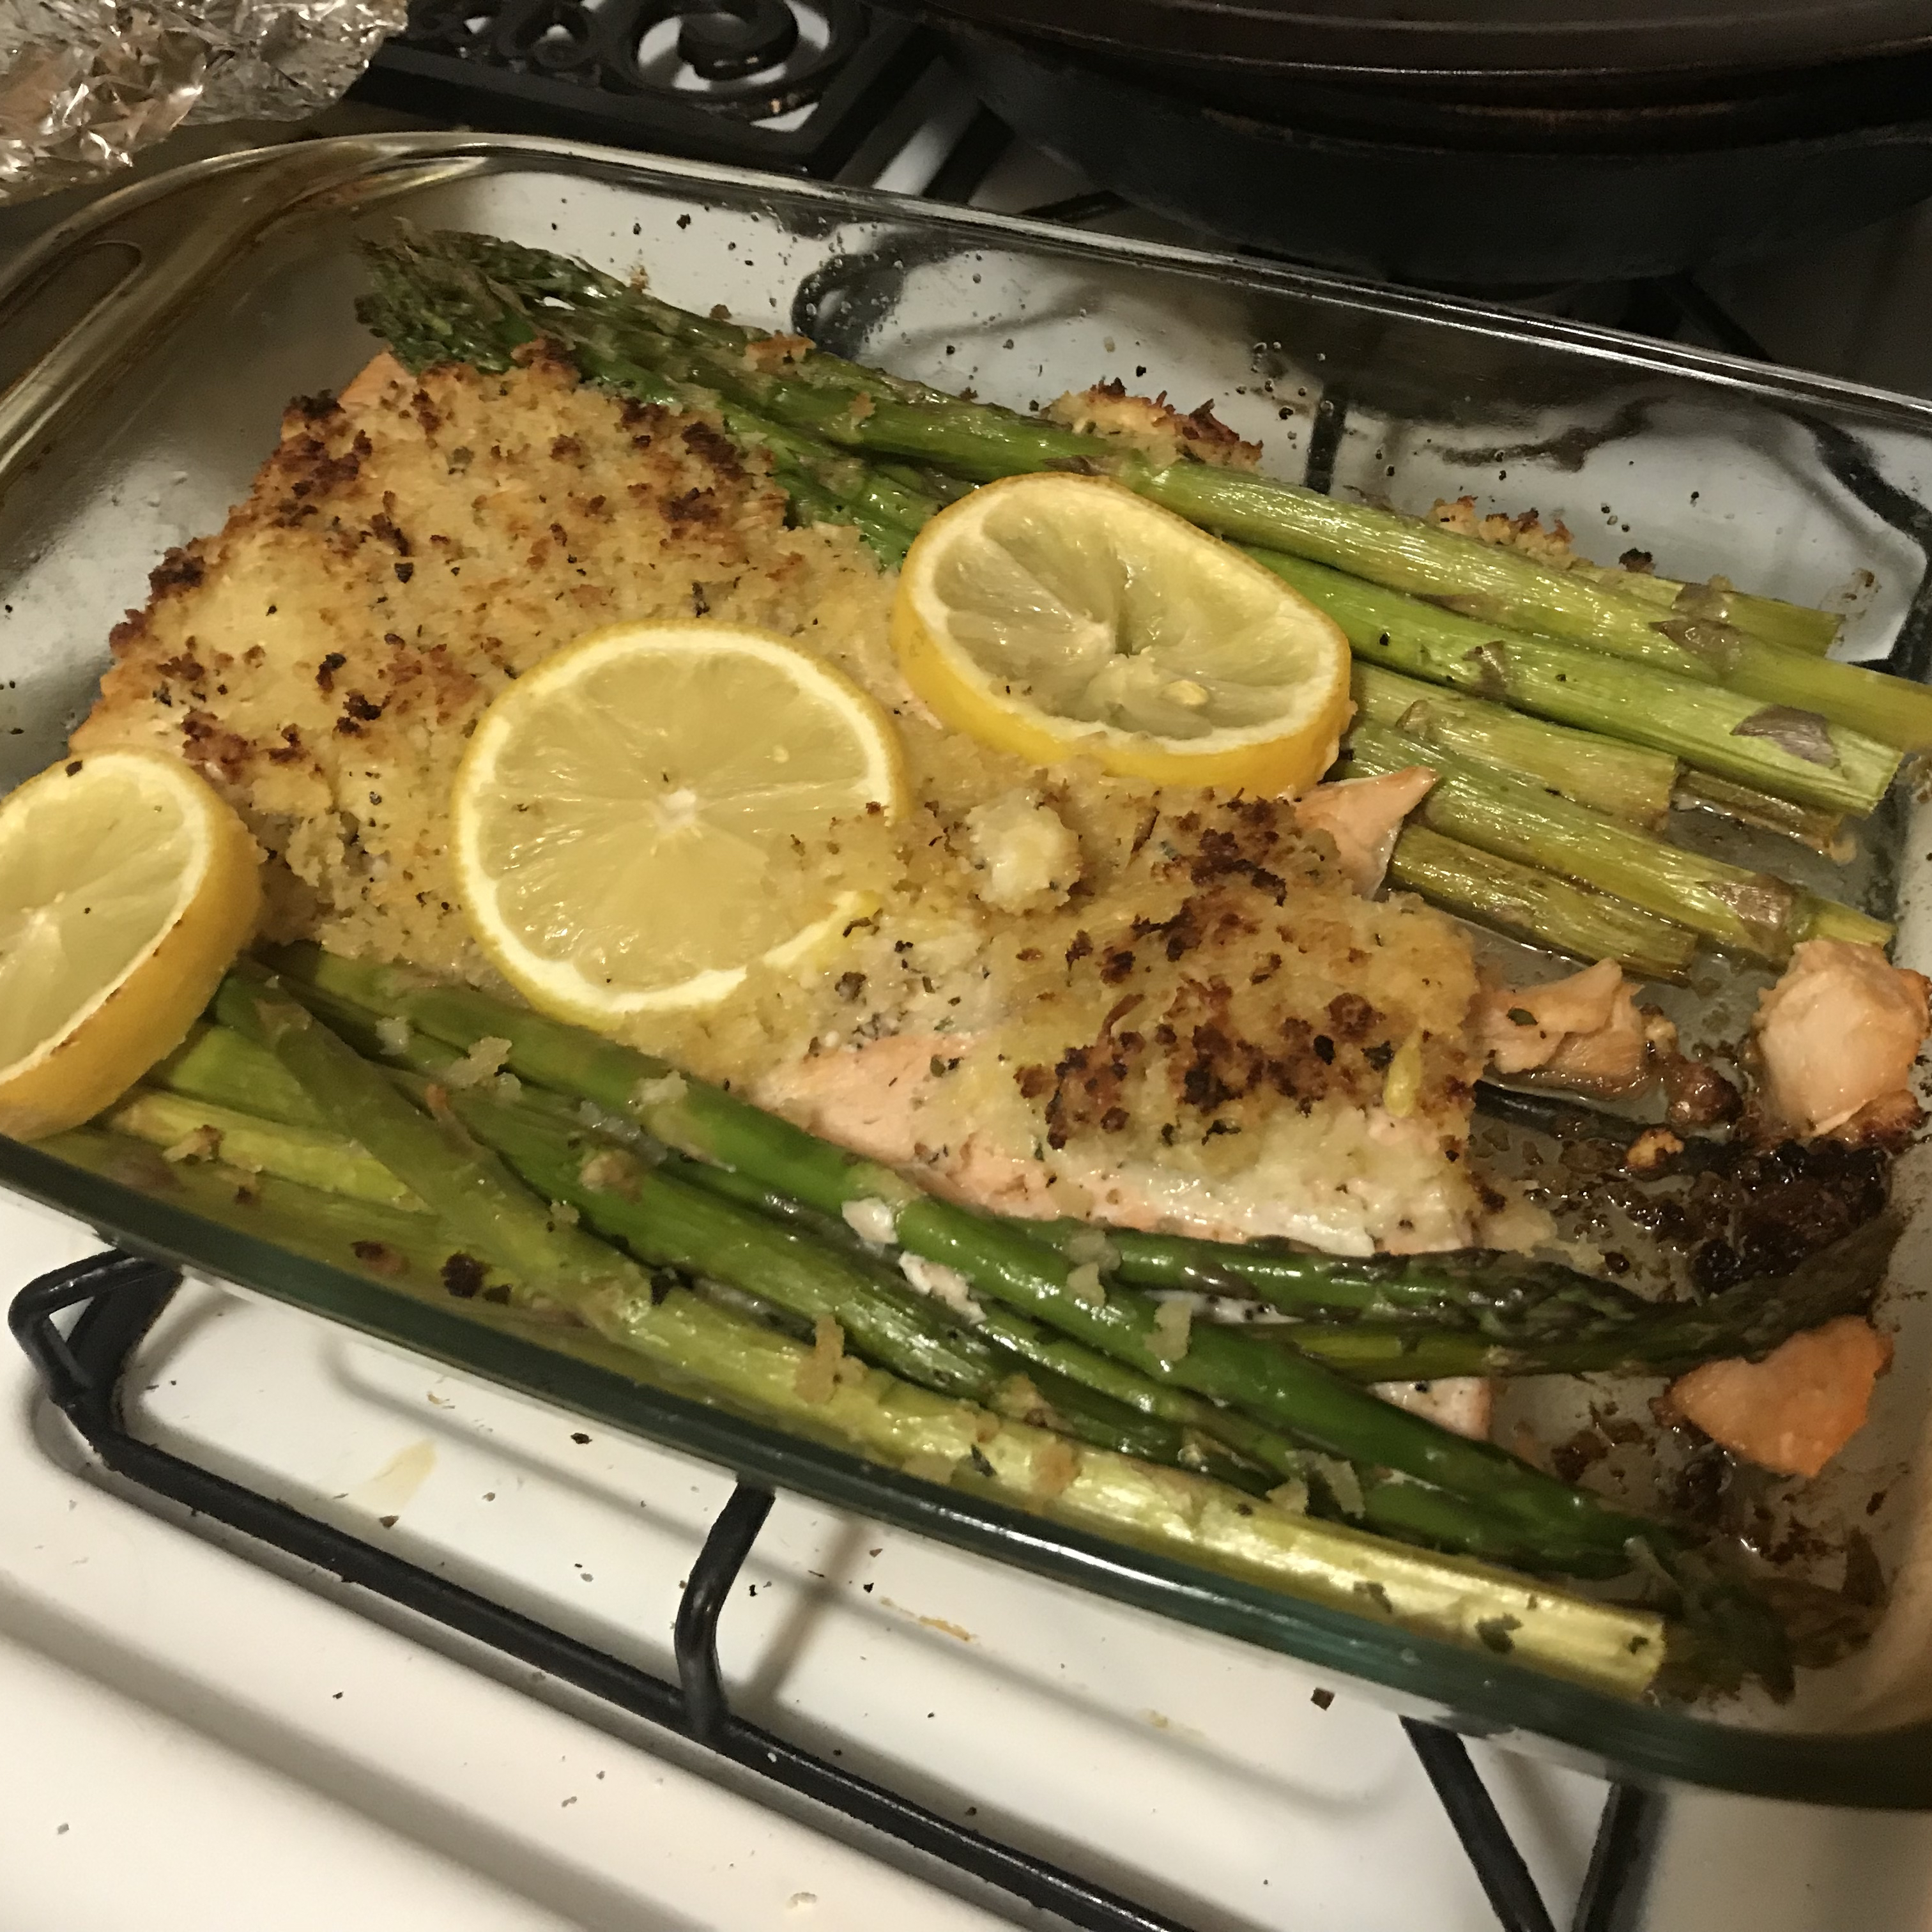 Baked Salmon with Basil and Lemon Thyme Crust baboyd2017